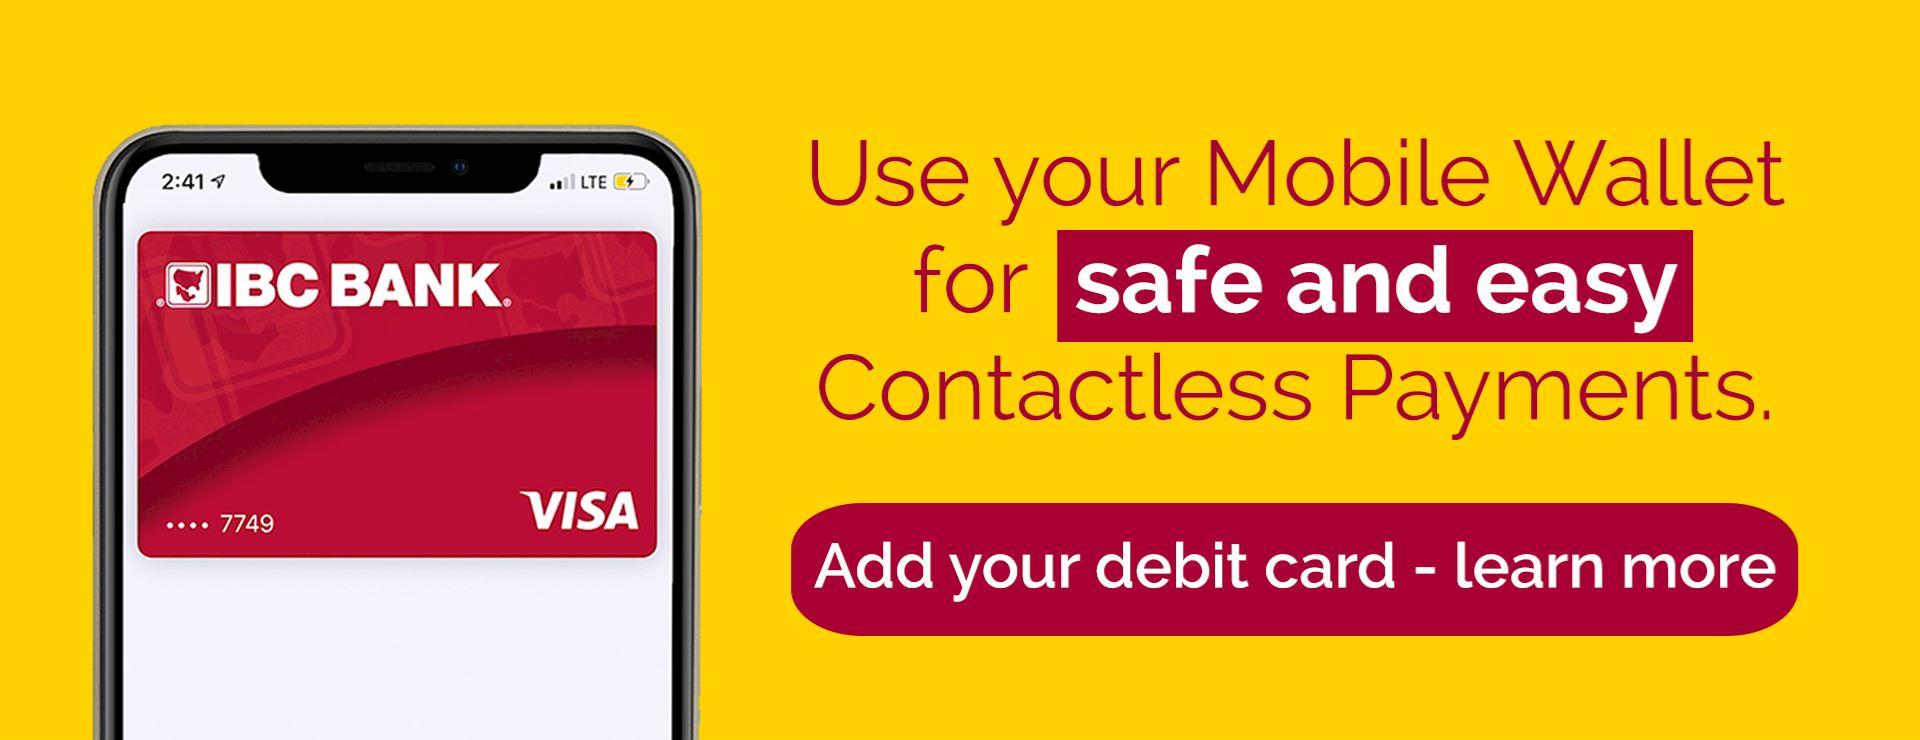 July 2020 - Mobile Wallet